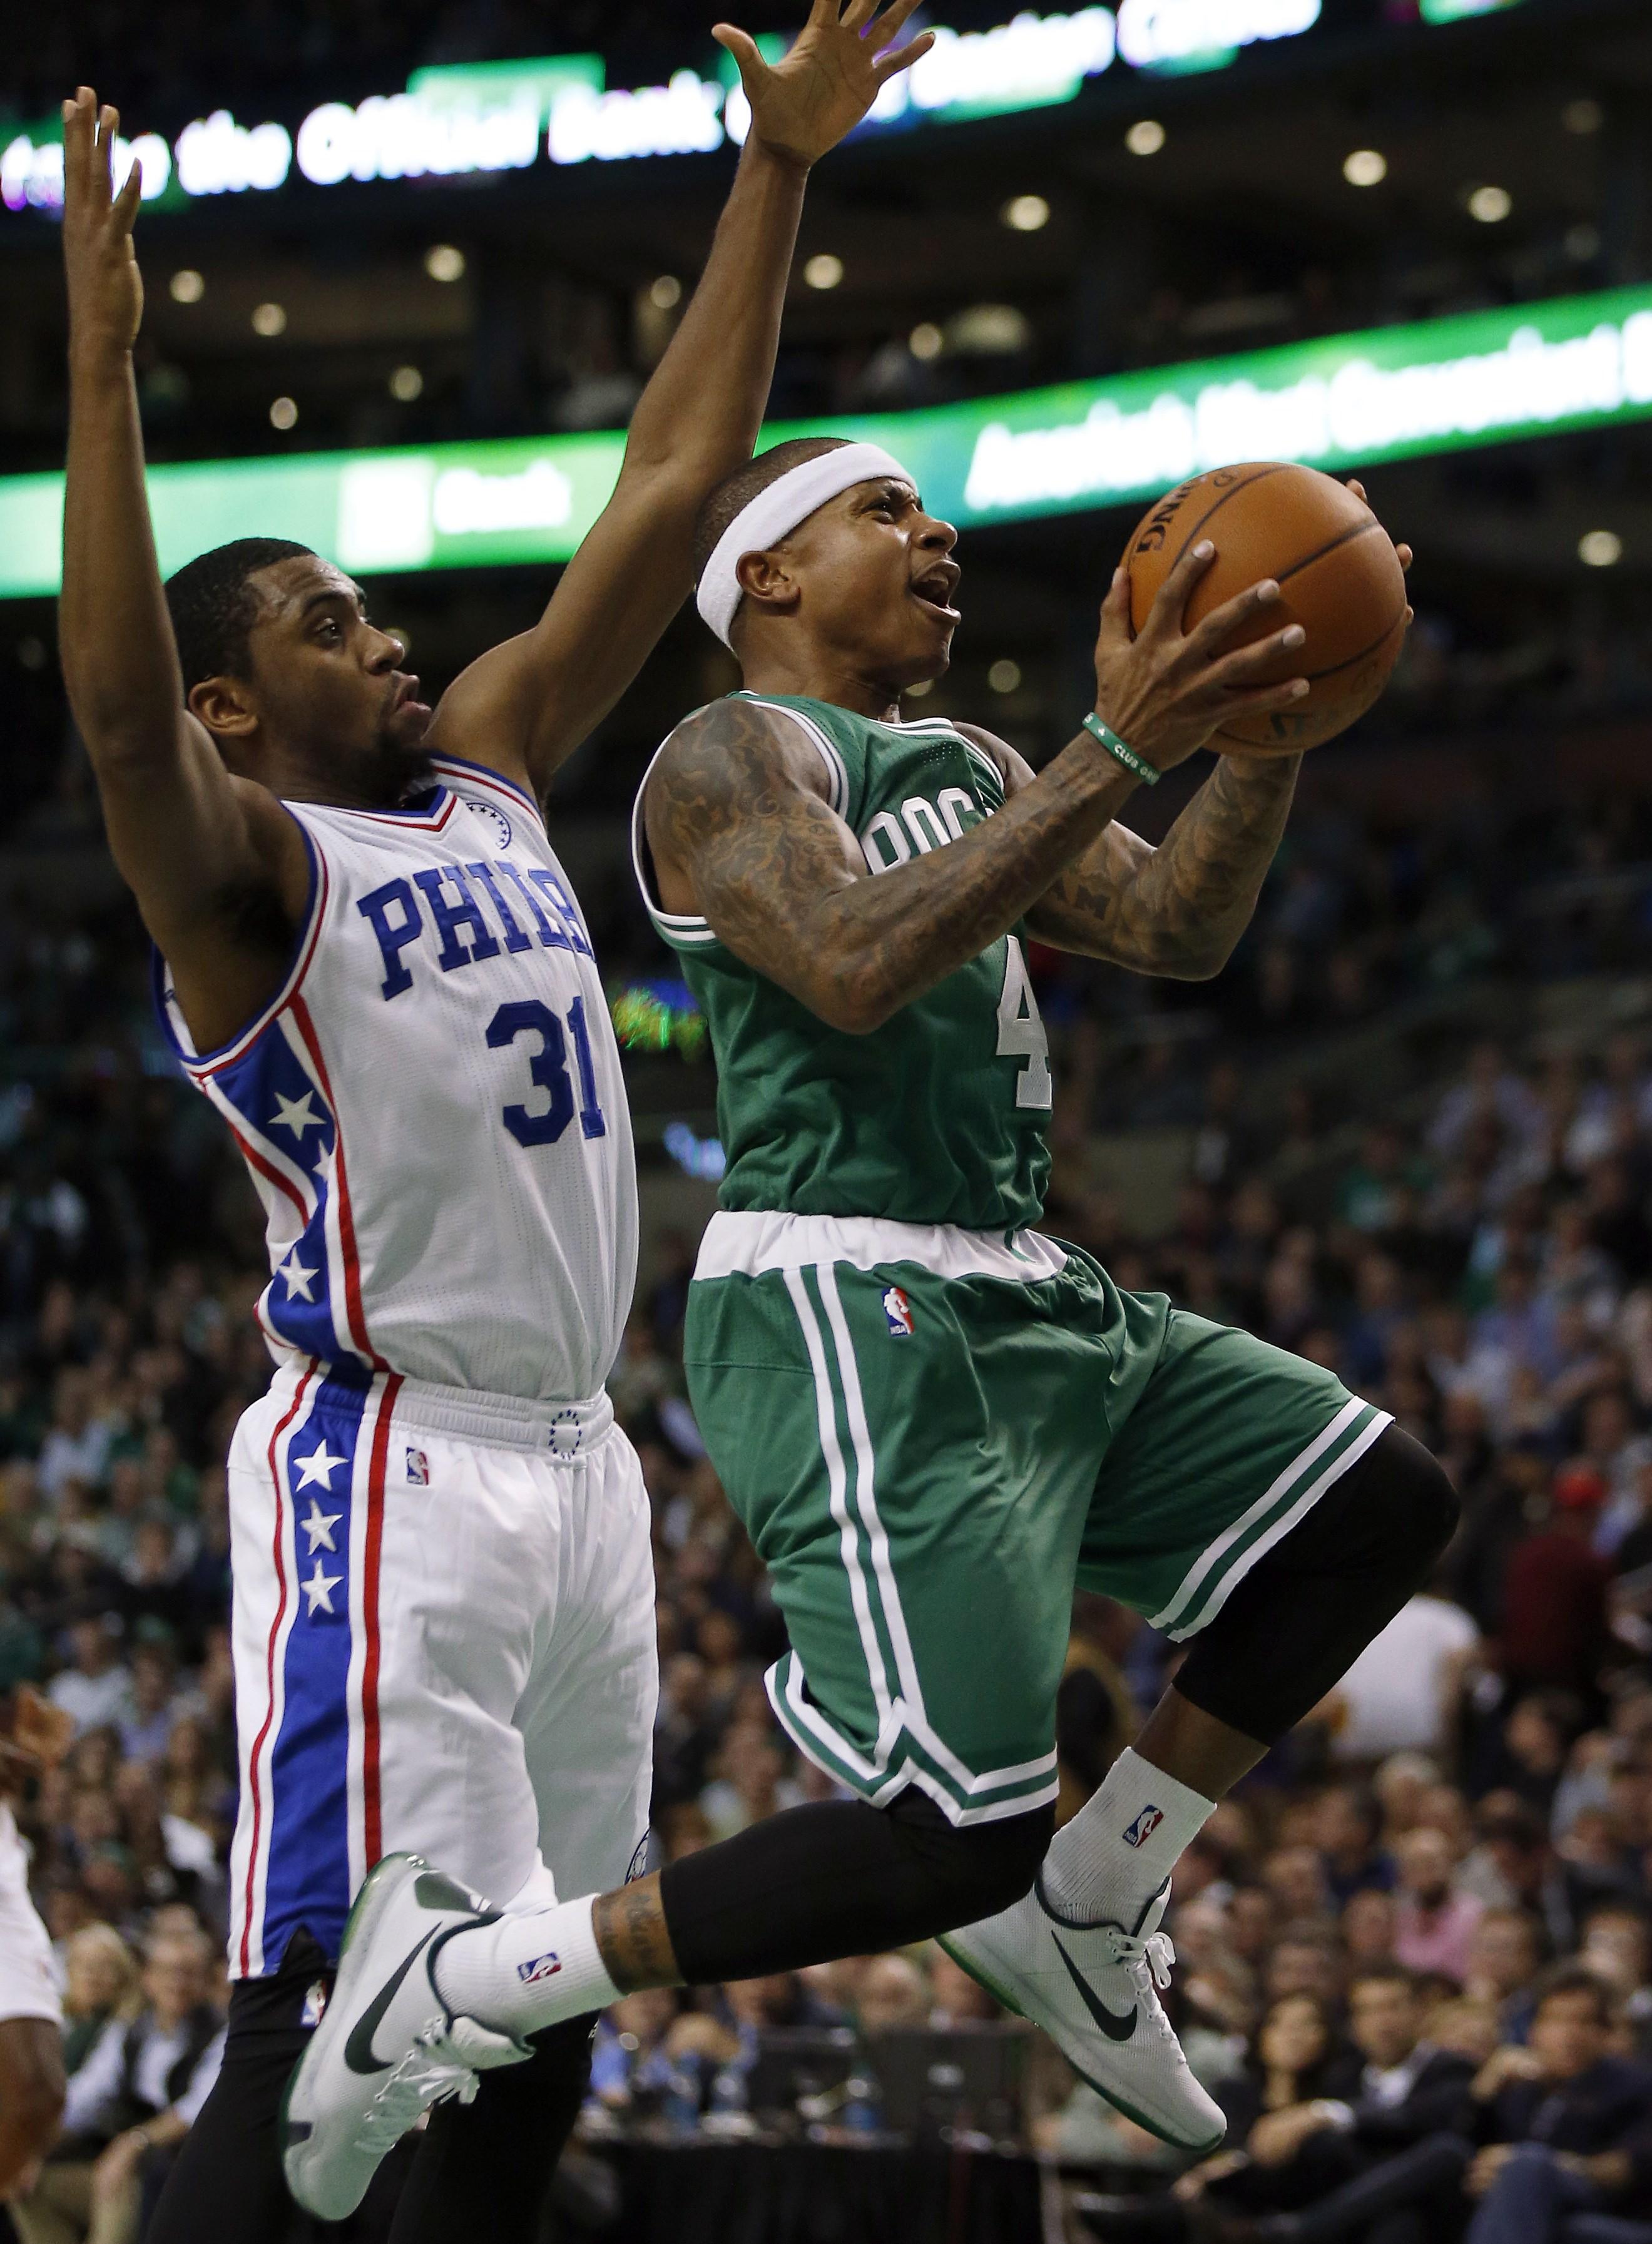 Boston Celtics' Isaiah Thomas (4) drives past Philadelphia 76ers' Hollis Thompson (31) during the second quarter of an NBA basketball game in Boston, Wednesday, Oct. 28, 2015. (AP Photo/Michael Dwyer)